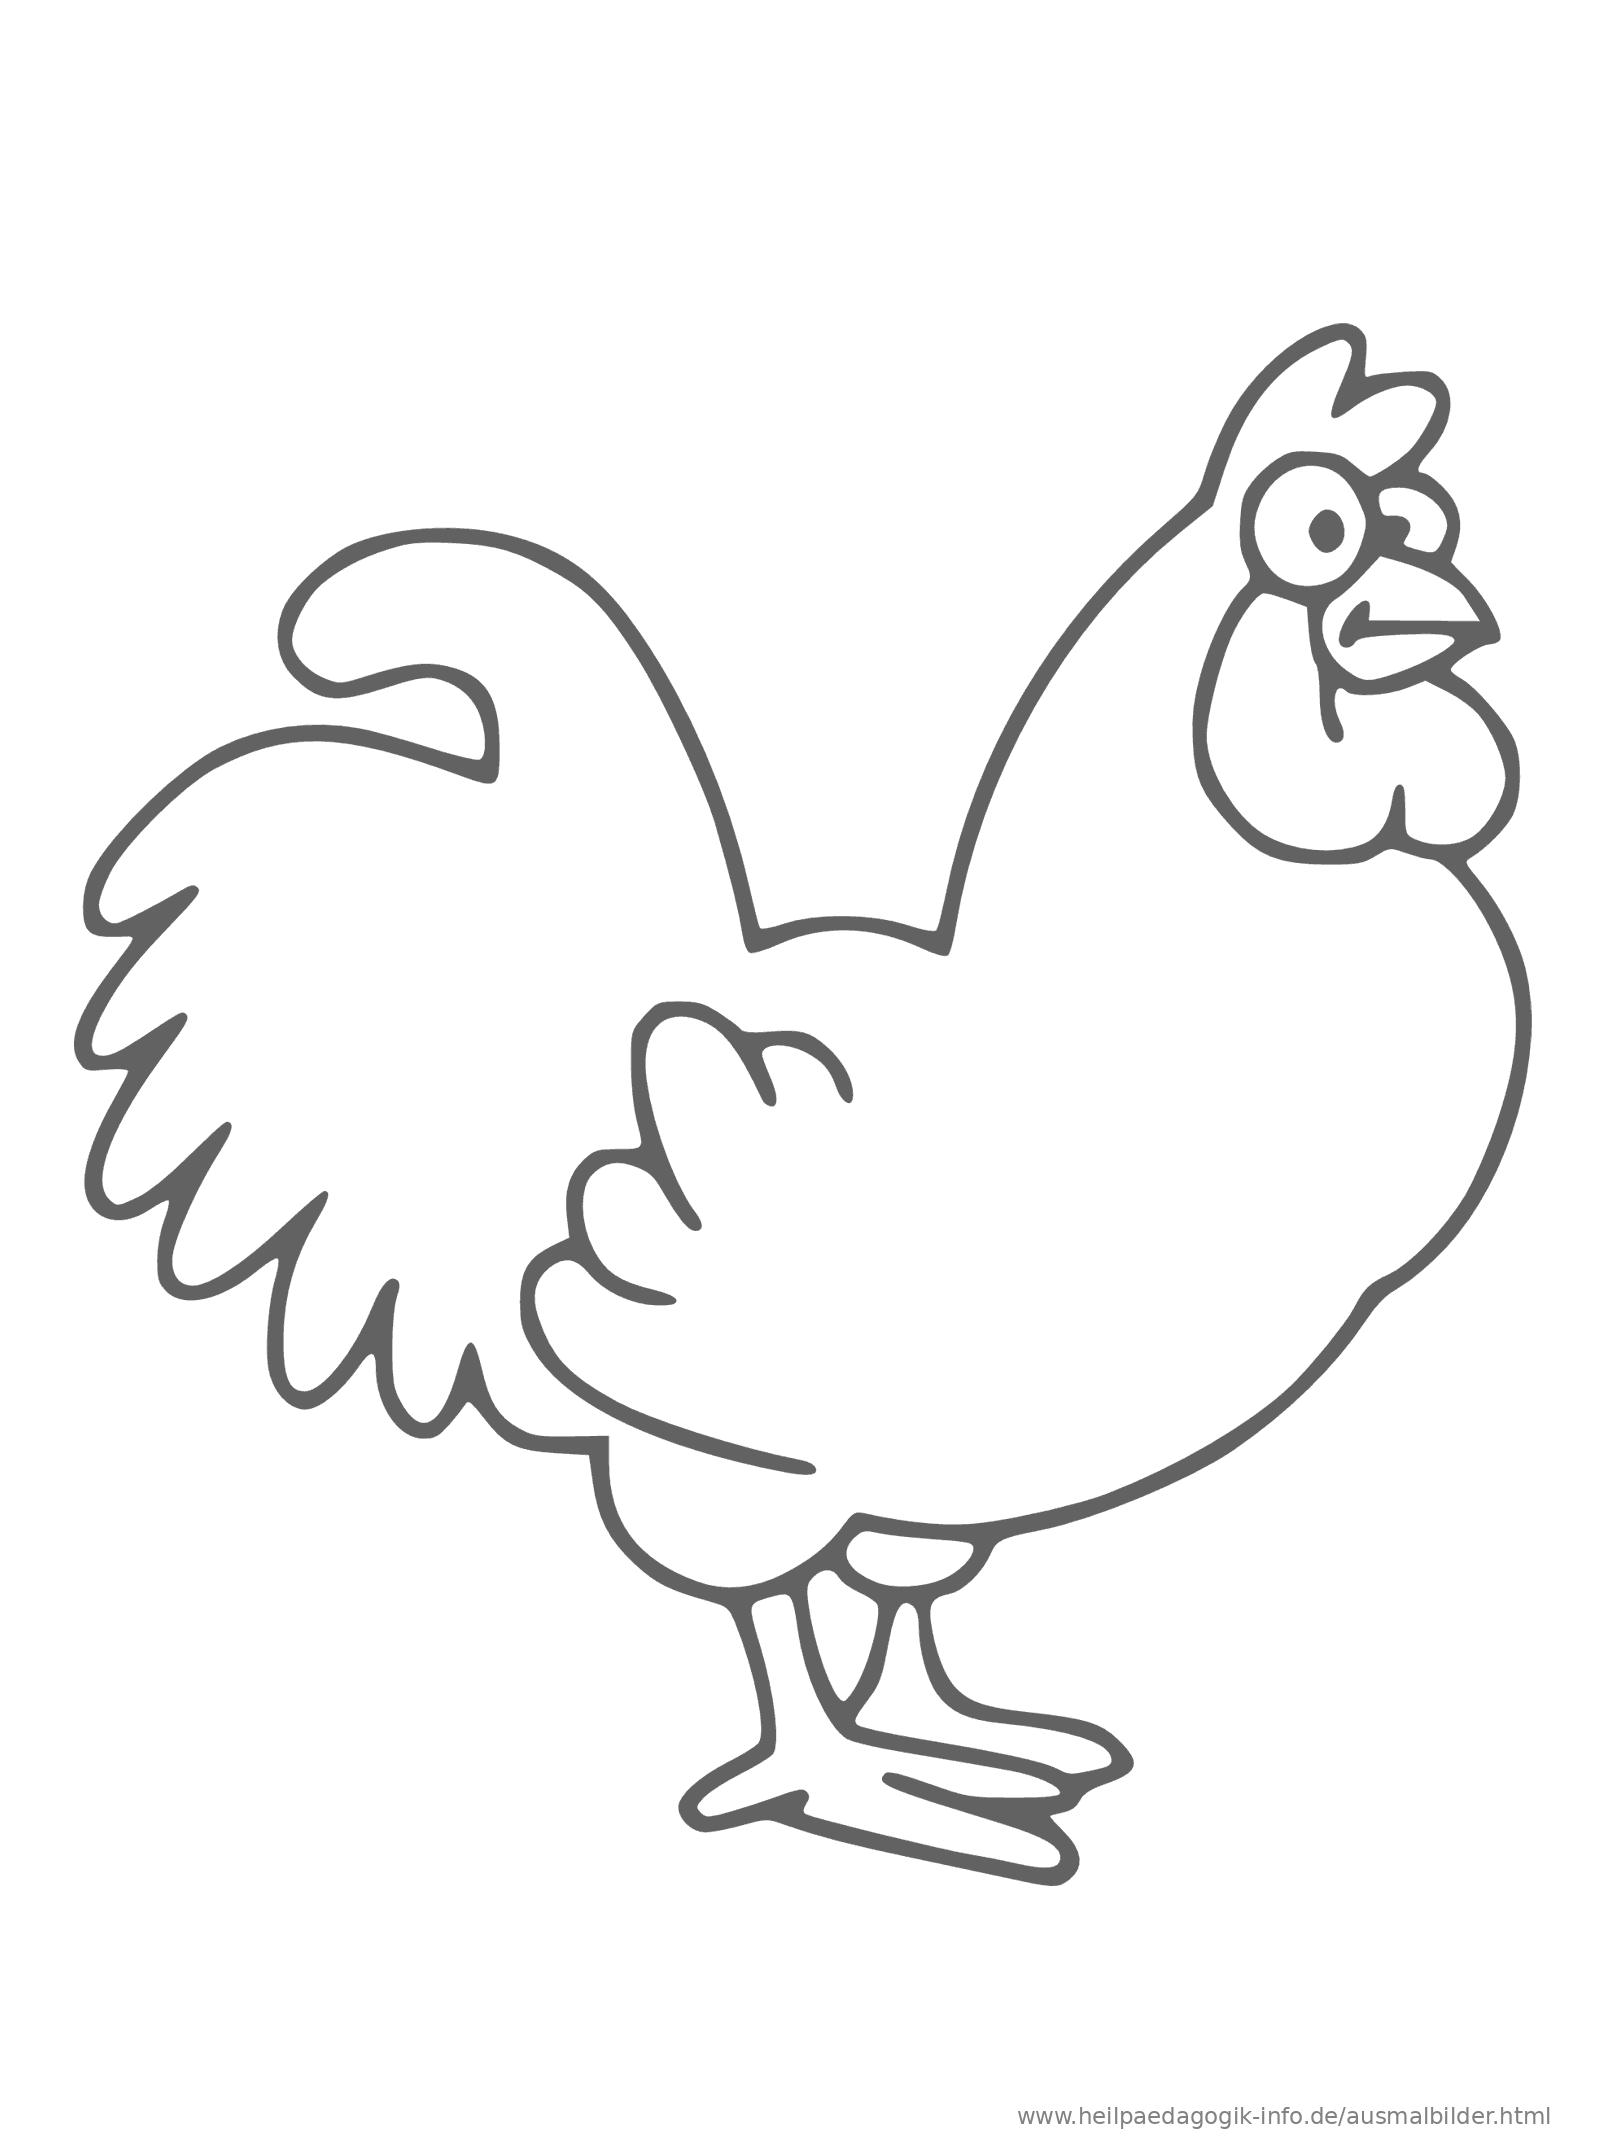 ausmalbilder für kinder vögel  ausmalbilder